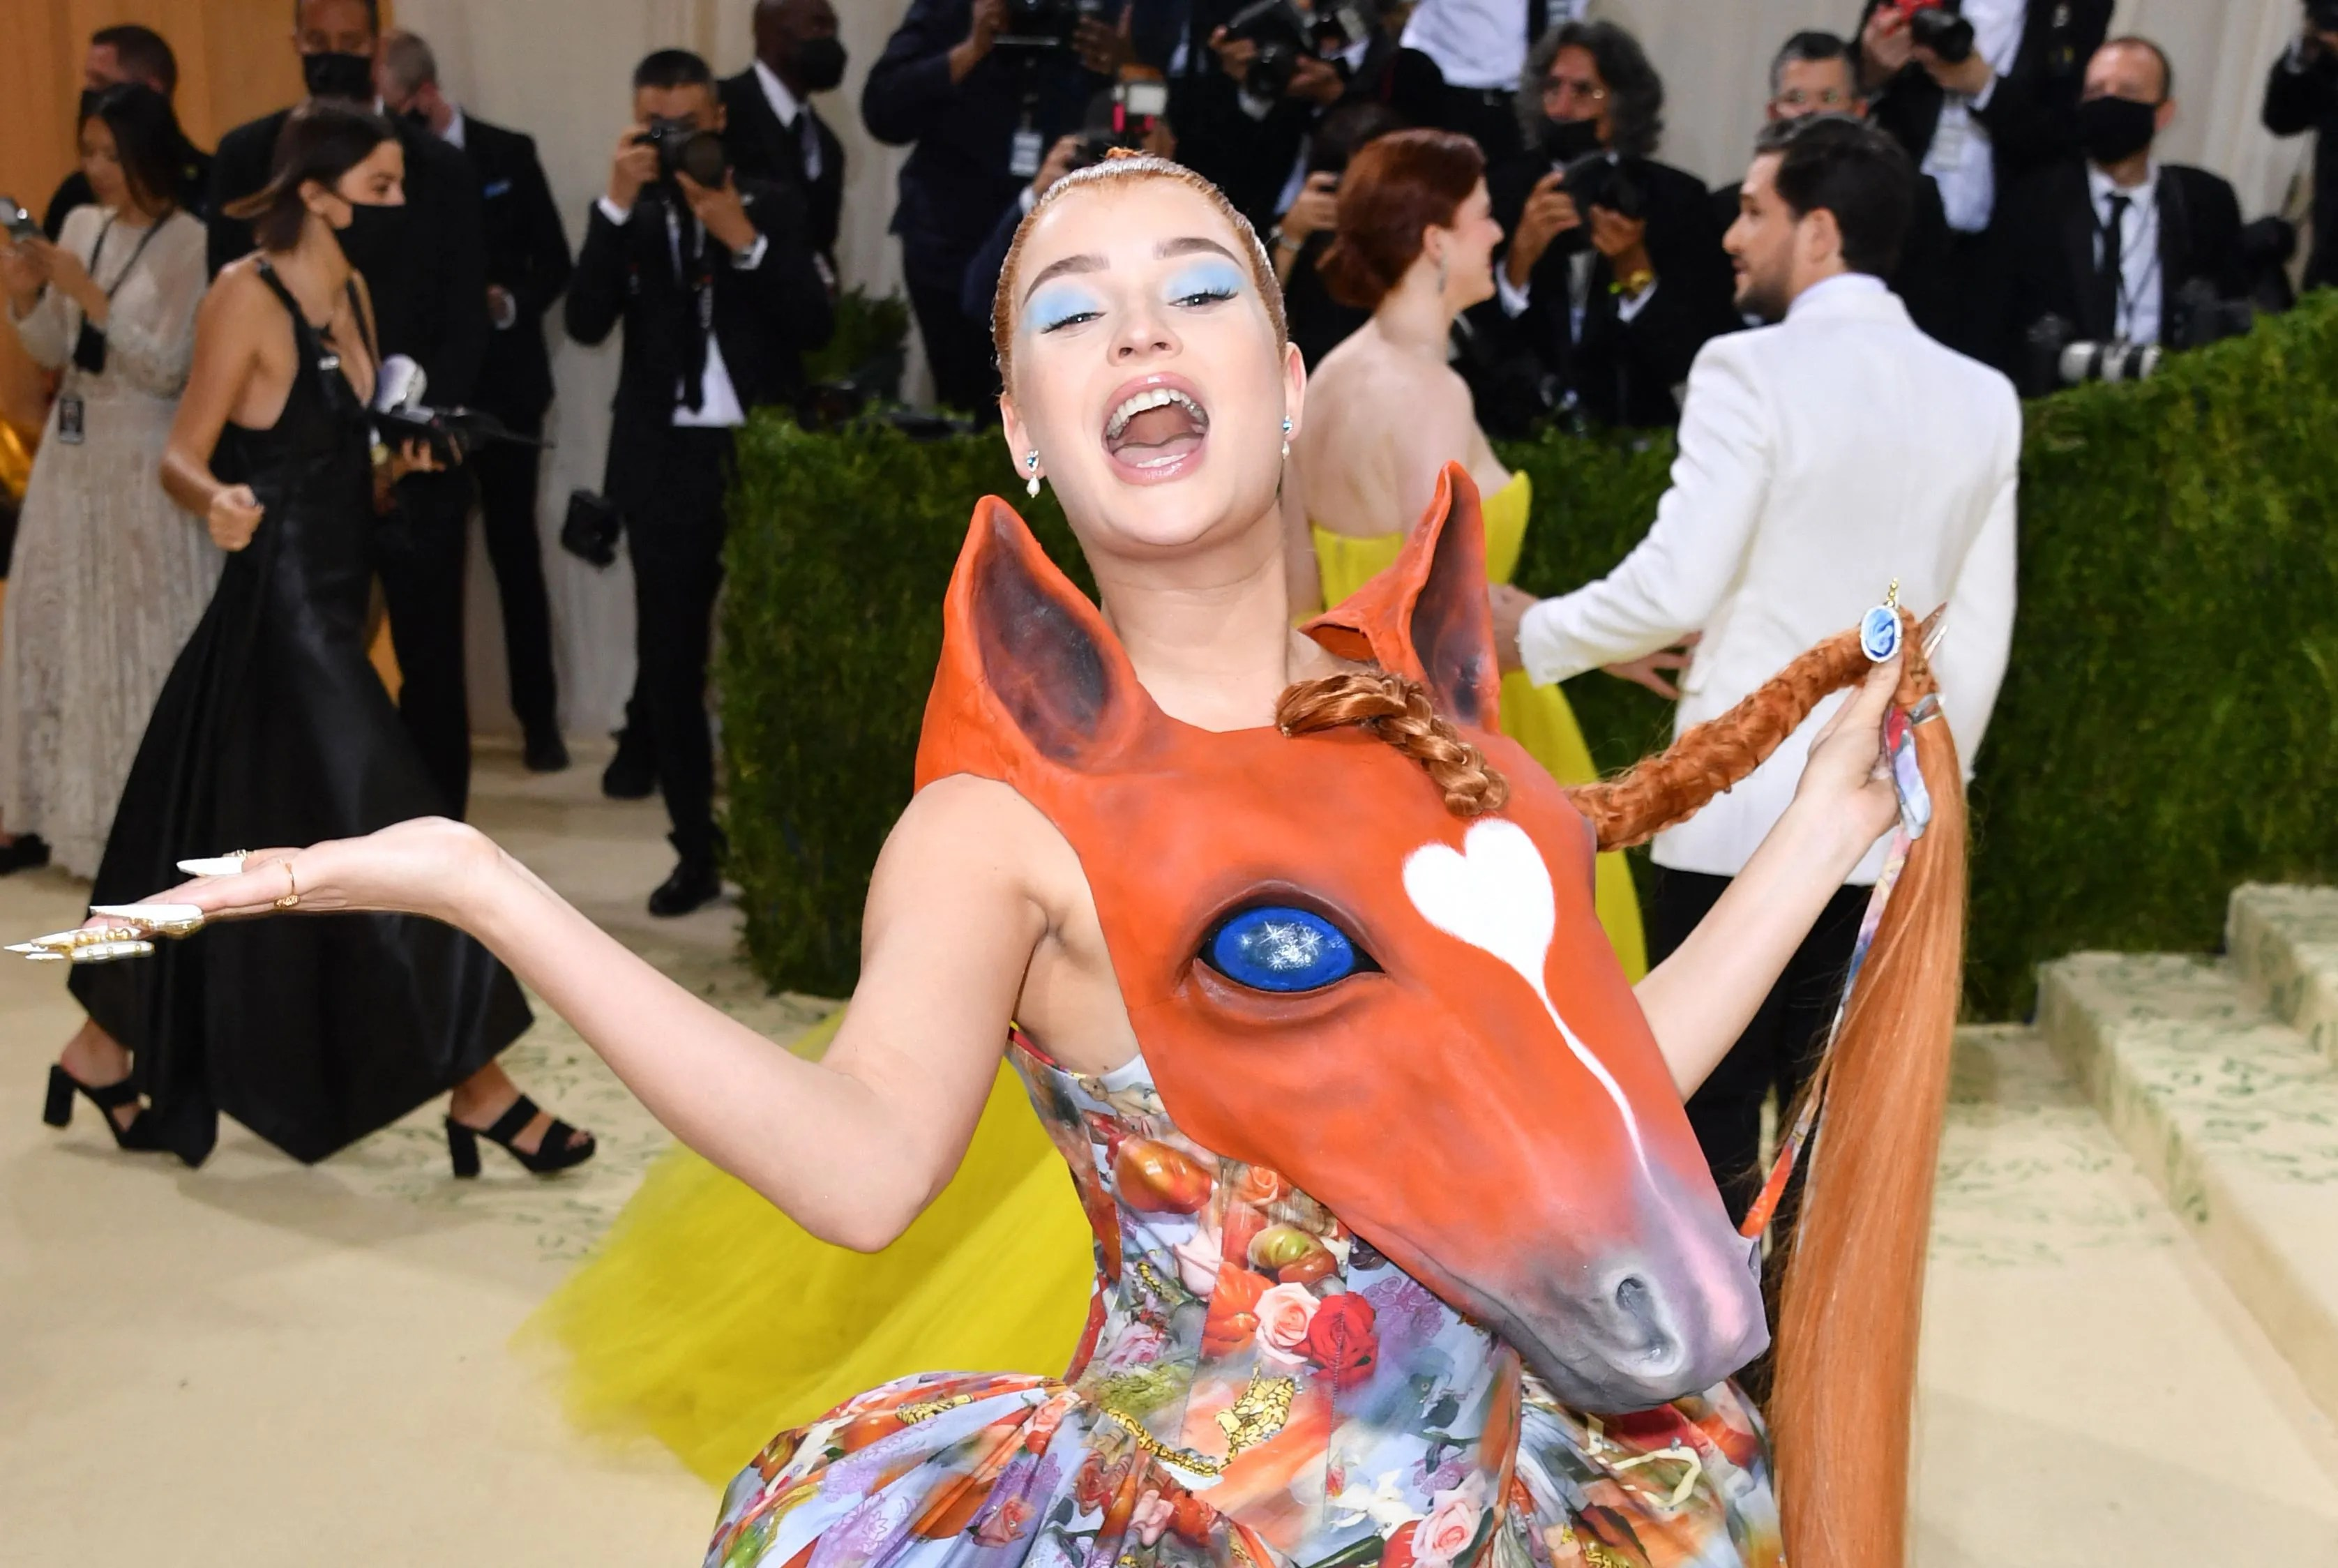 German singer Kim Petras arrives for the 2021 Met Gala at the Metropolitan Museum of Art on September 13, 2021 in New York.